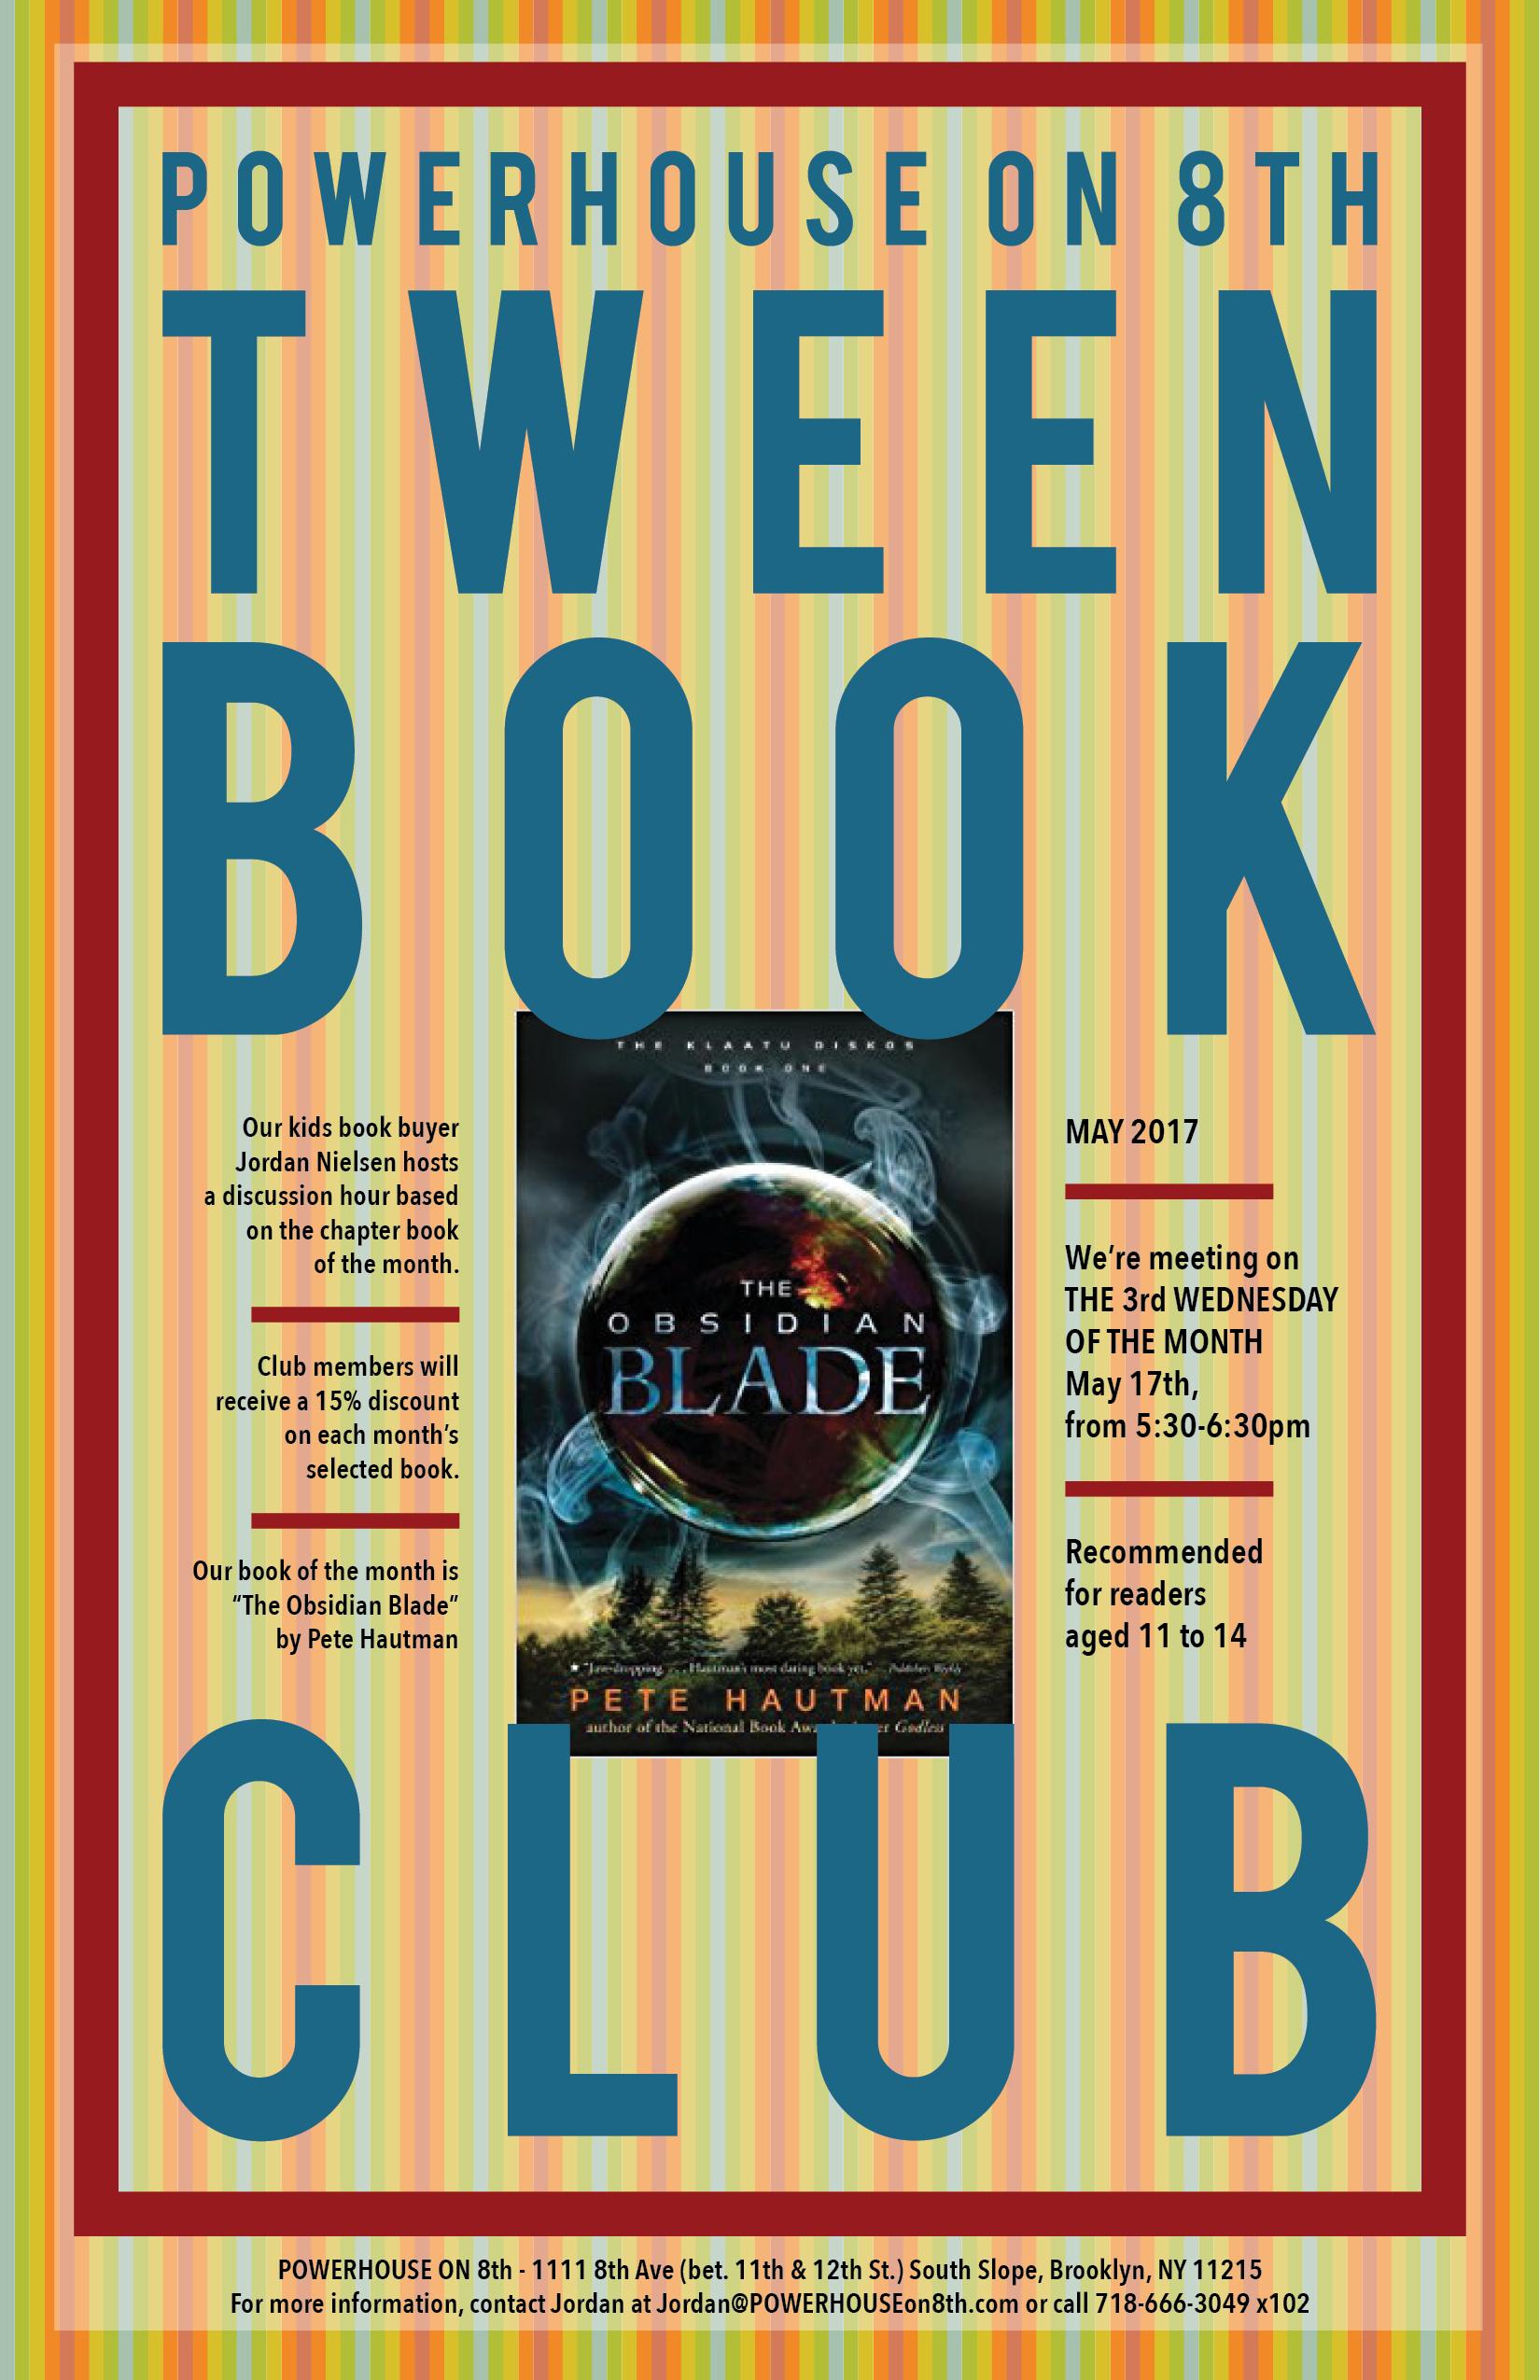 Tween Book Club: The Obsidian Blade by Pete Hautman